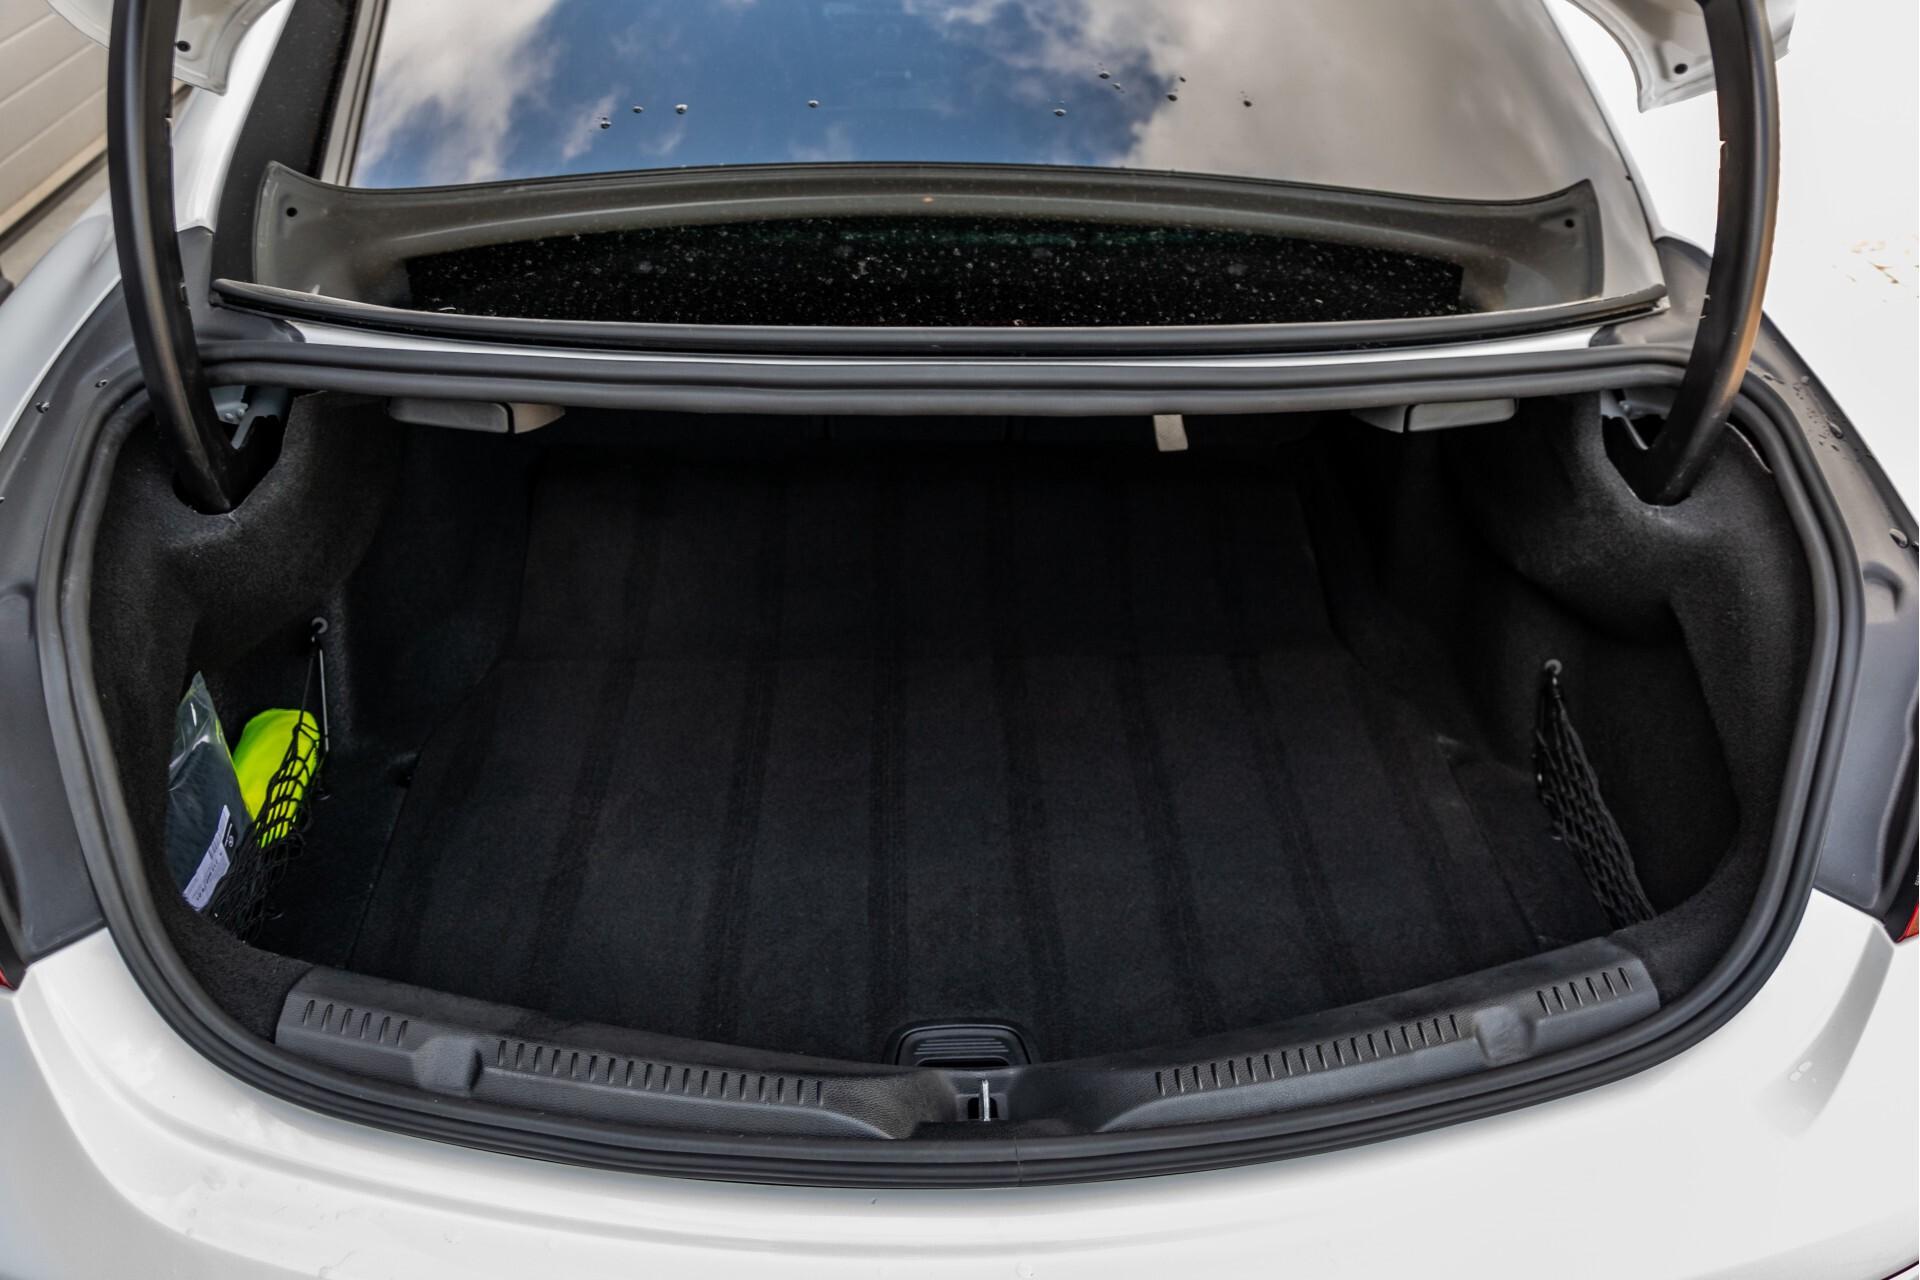 Mercedes-Benz E-Klasse Coupé 300 AMG Panorama/Rij-assist/Keyless/Massage/Memory/HUD/Standkachel/Night Aut9 Foto 56